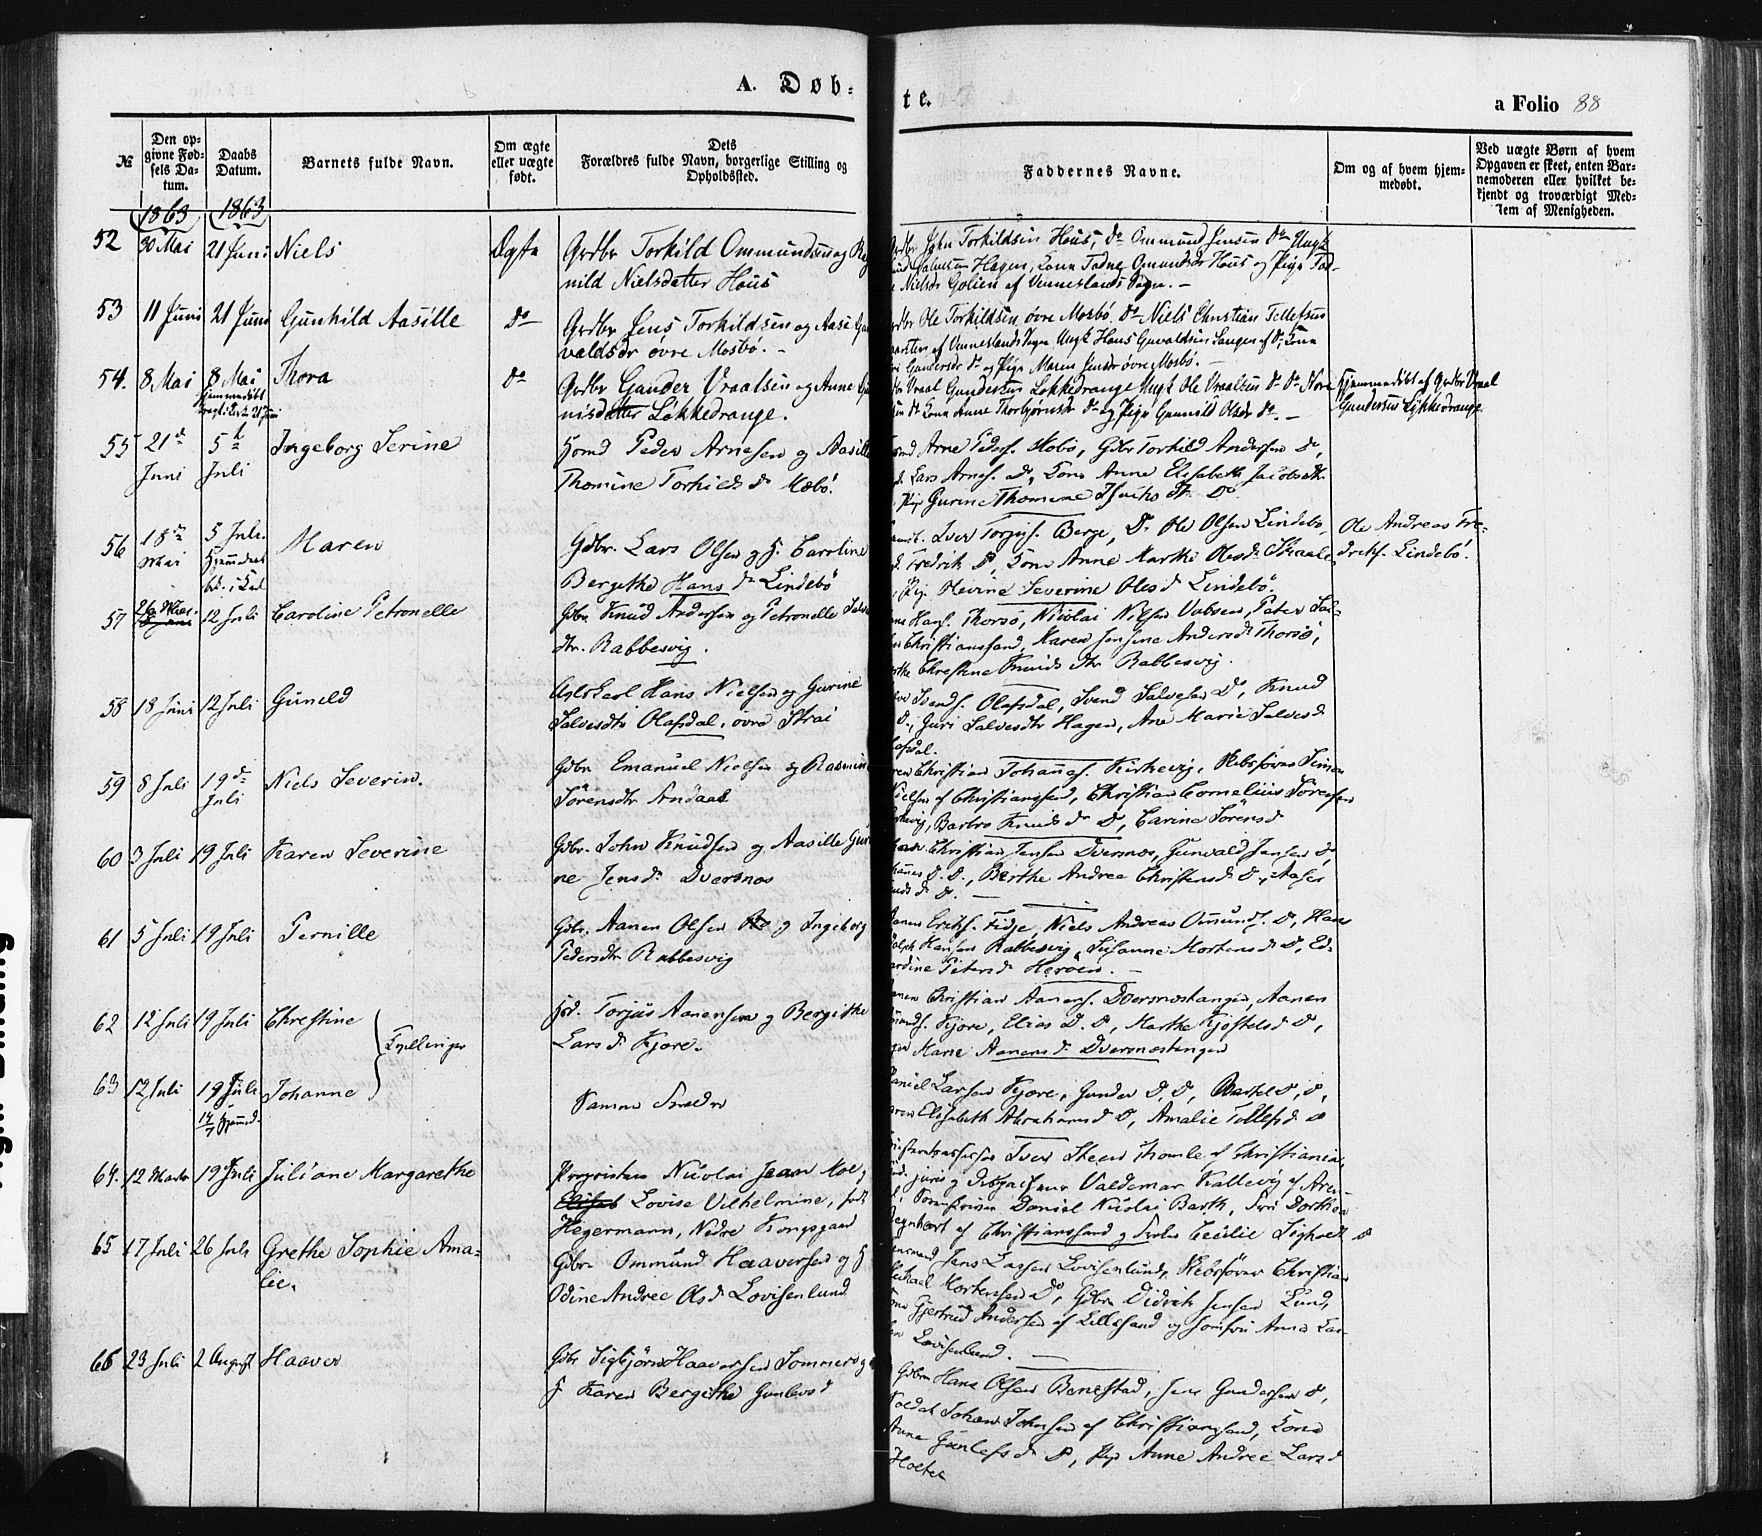 SAK, Oddernes sokneprestkontor, F/Fa/Faa/L0007: Ministerialbok nr. A 7, 1851-1863, s. 88